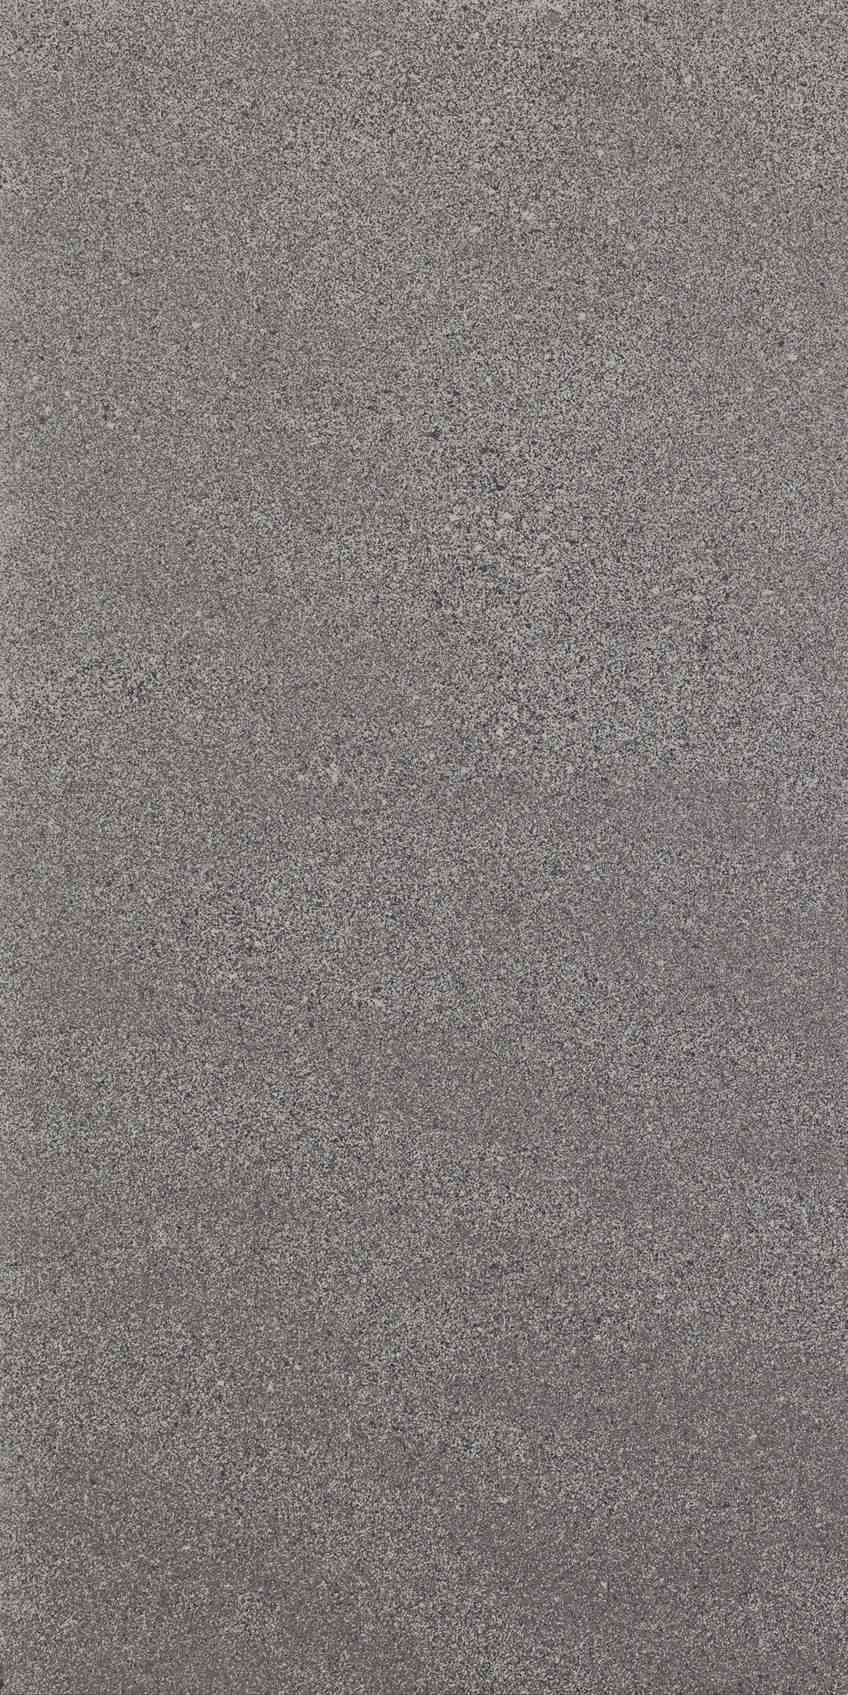 Duroteq Grafit Gres Rekt. Mat.  - Szary - 298x598 - Płytki podłogowe - Duroteq